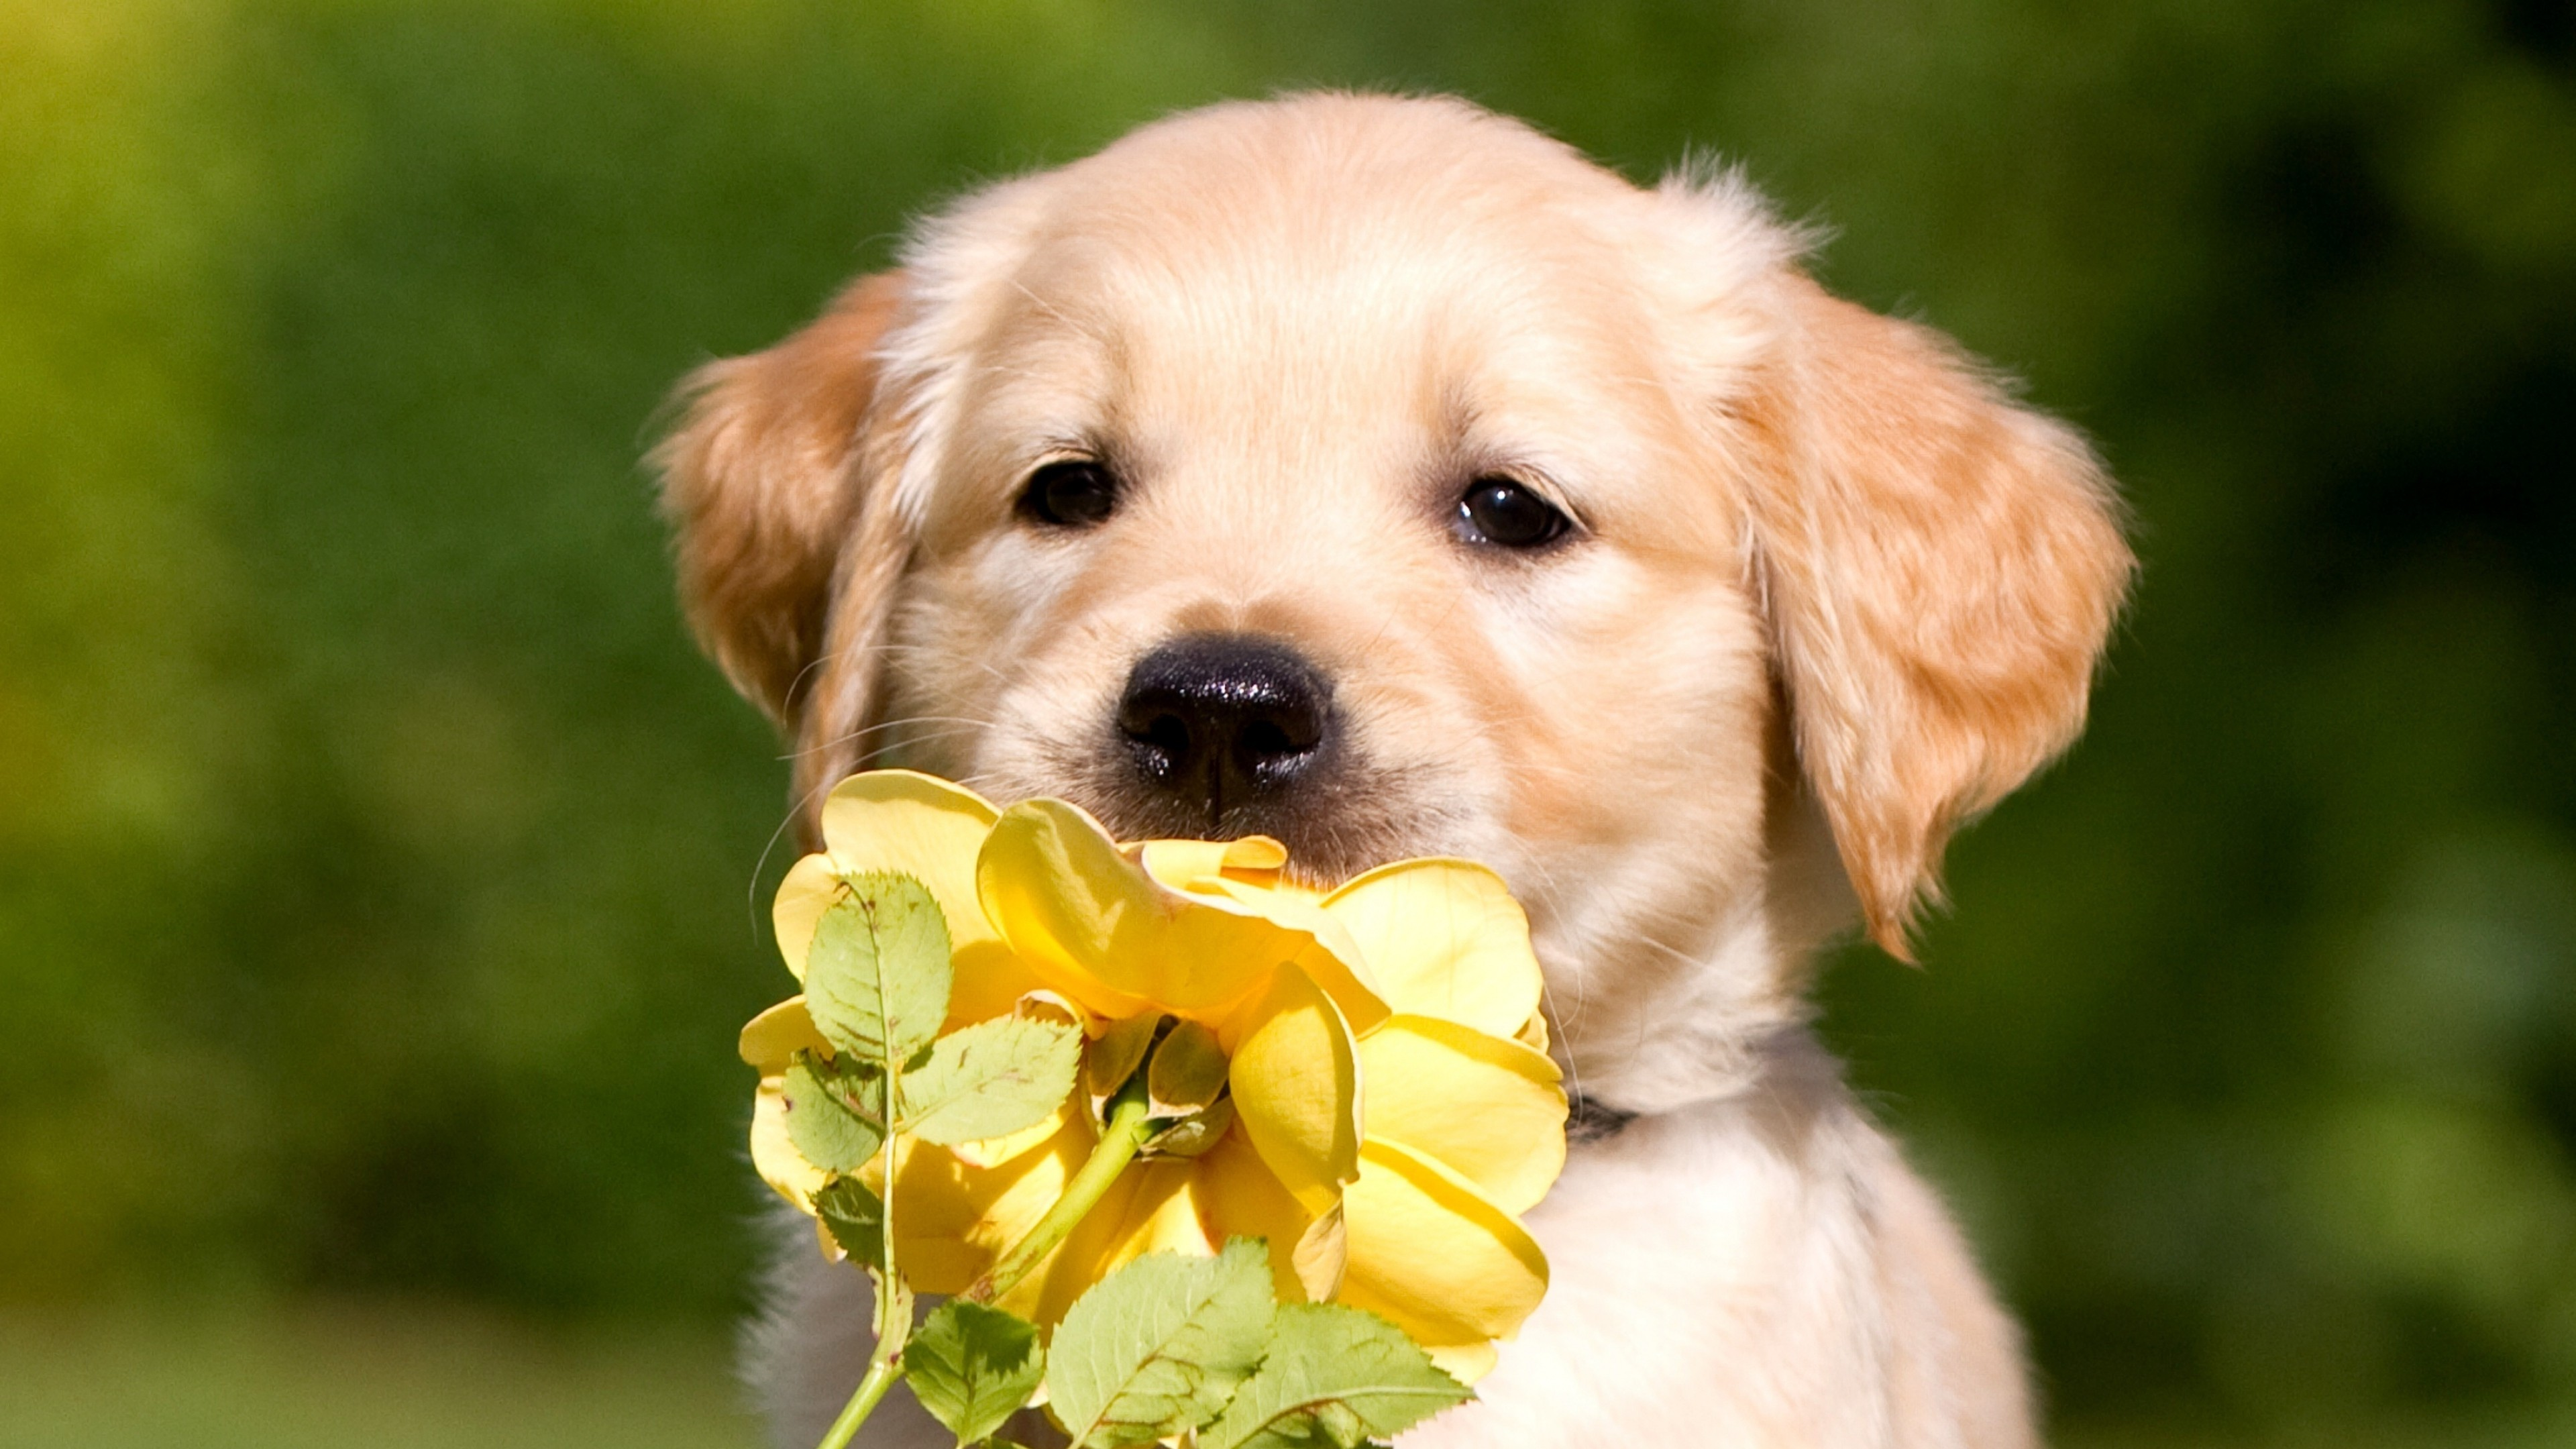 retriever puppy petals 4k 1542237843 - Retriever Puppy Petals 4k - puppy wallpapers, petals wallpapers, labrador retriever wallpapers, dog wallpapers, animals wallpapers